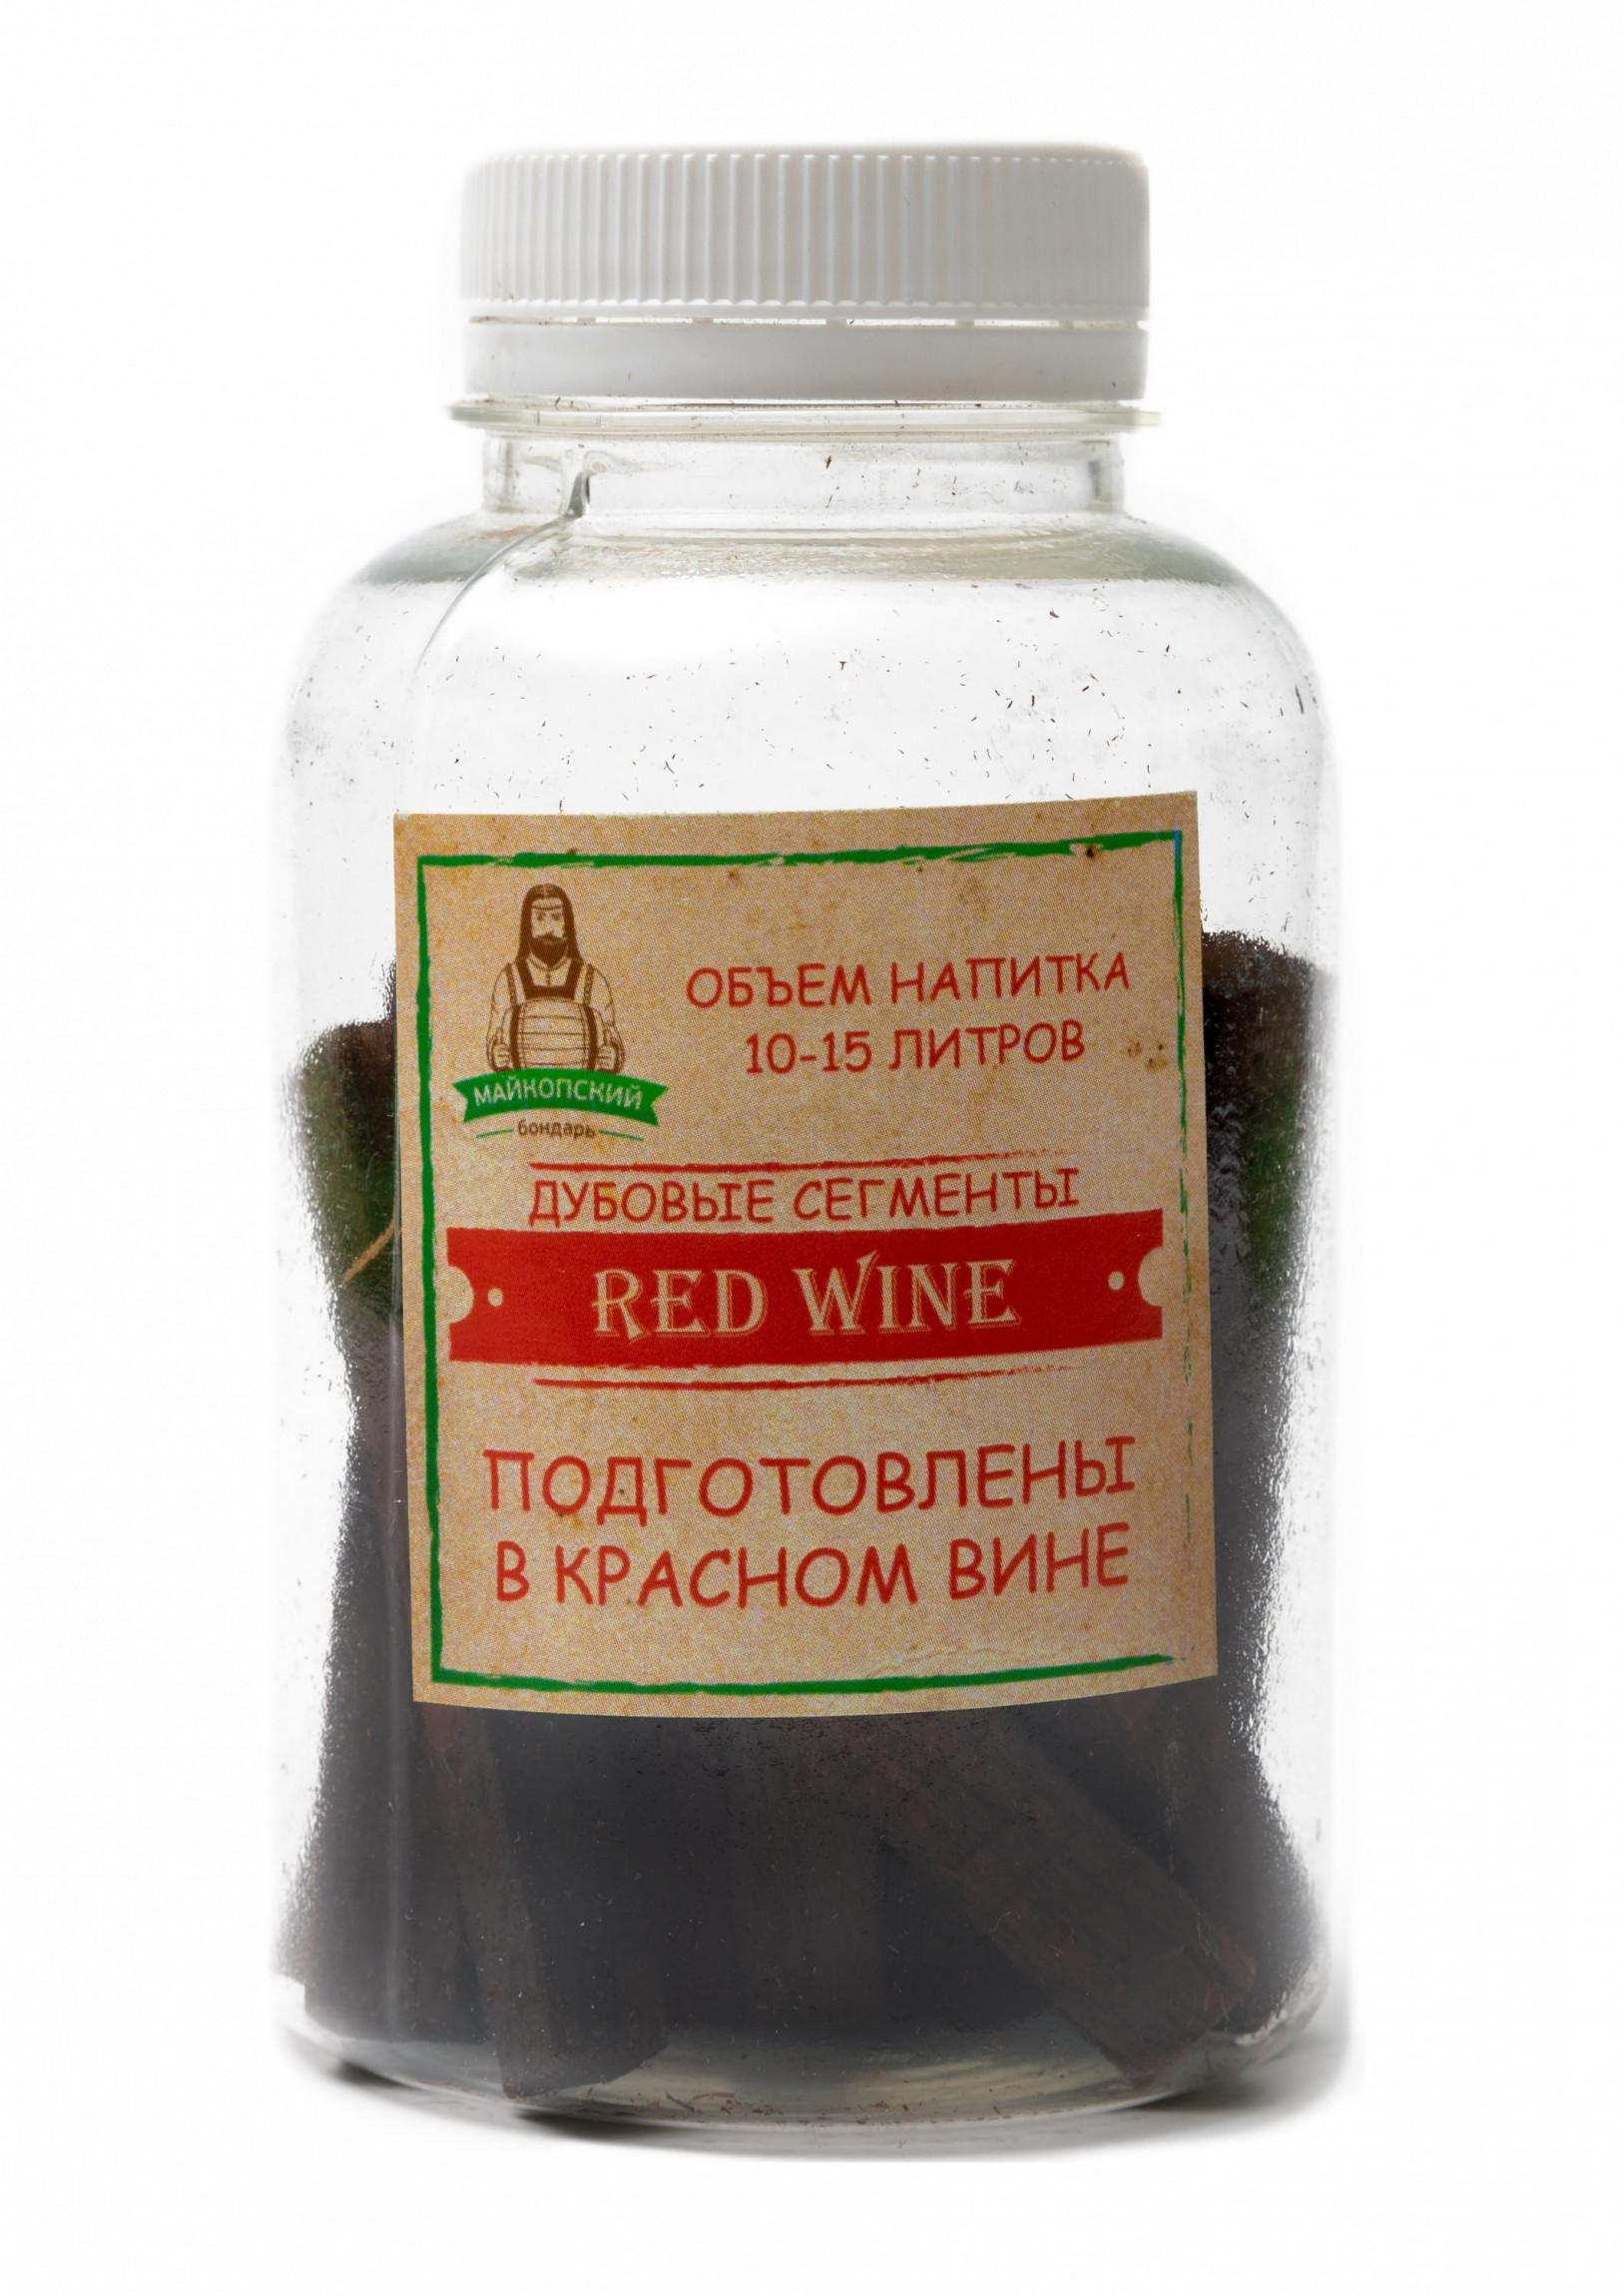 Дубовые сегменты Red Wine (Майкопский бондарь)